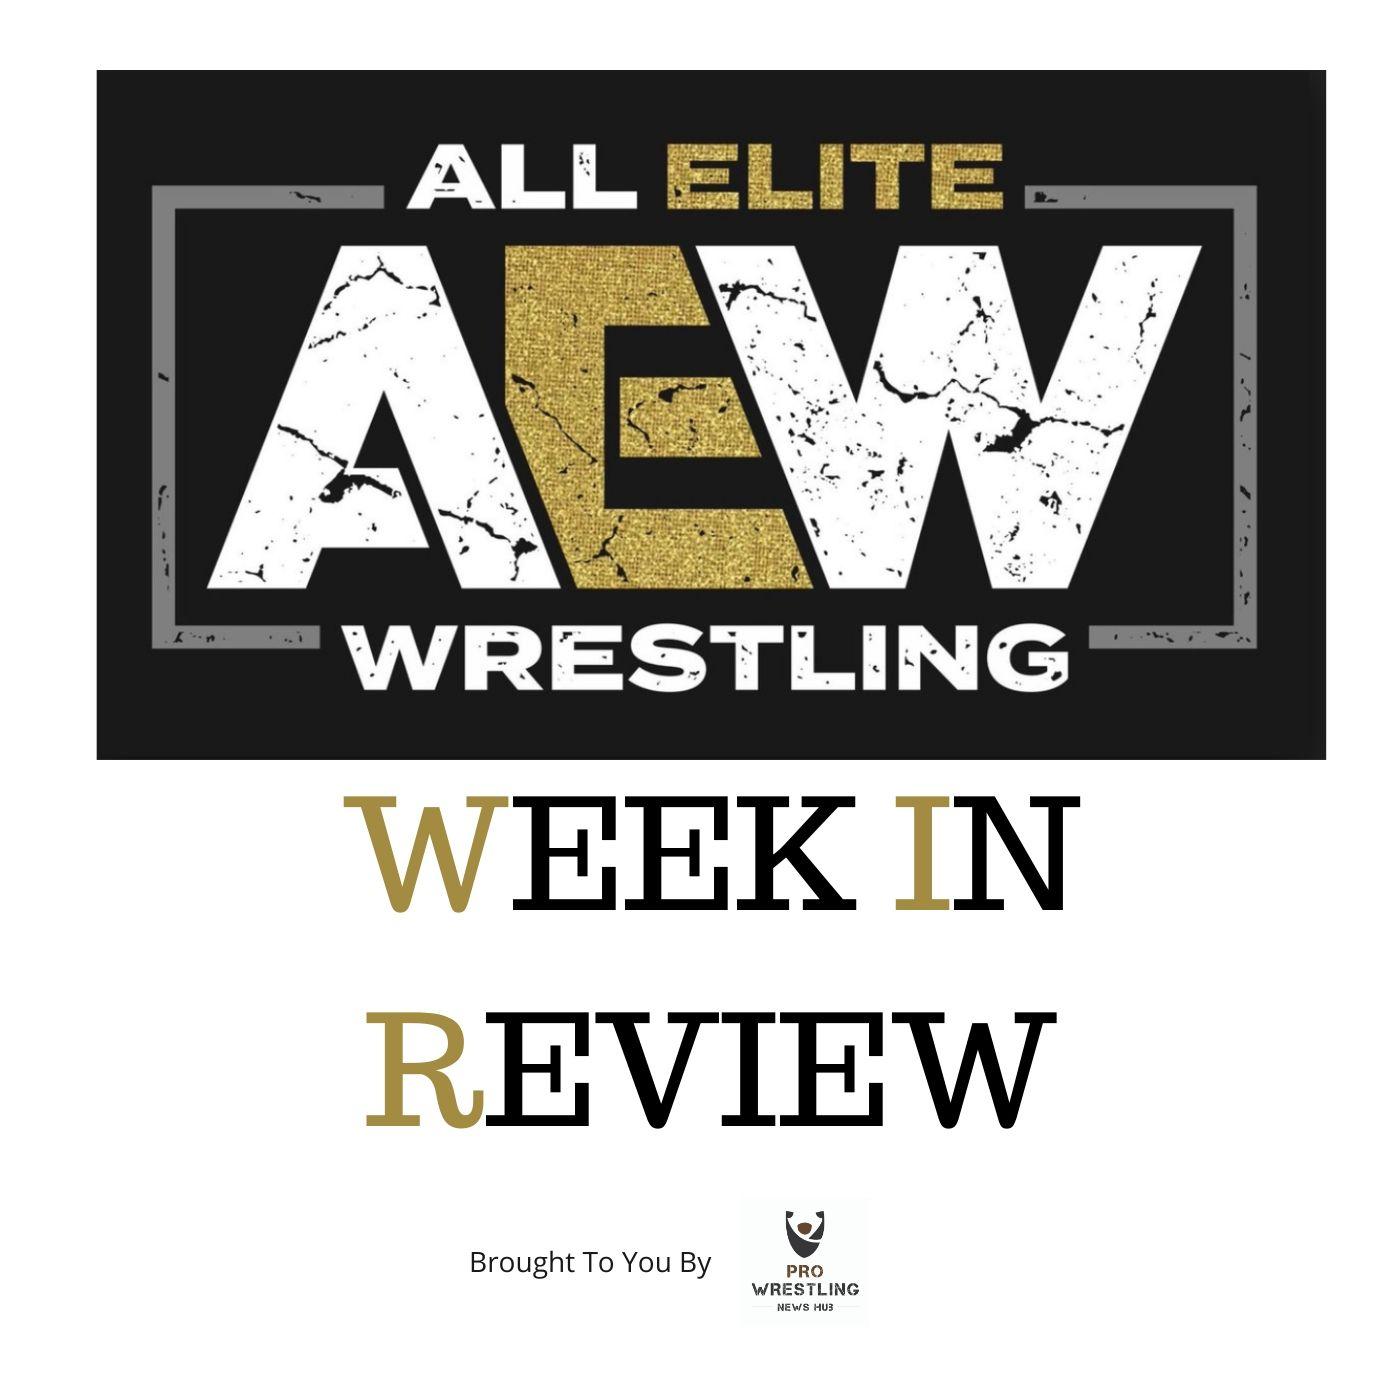 #35 – First Look At AEW Fantasy Wrestling, Top AEW Wrestlers Of 2020, AEW Dynamite Recap & Grades